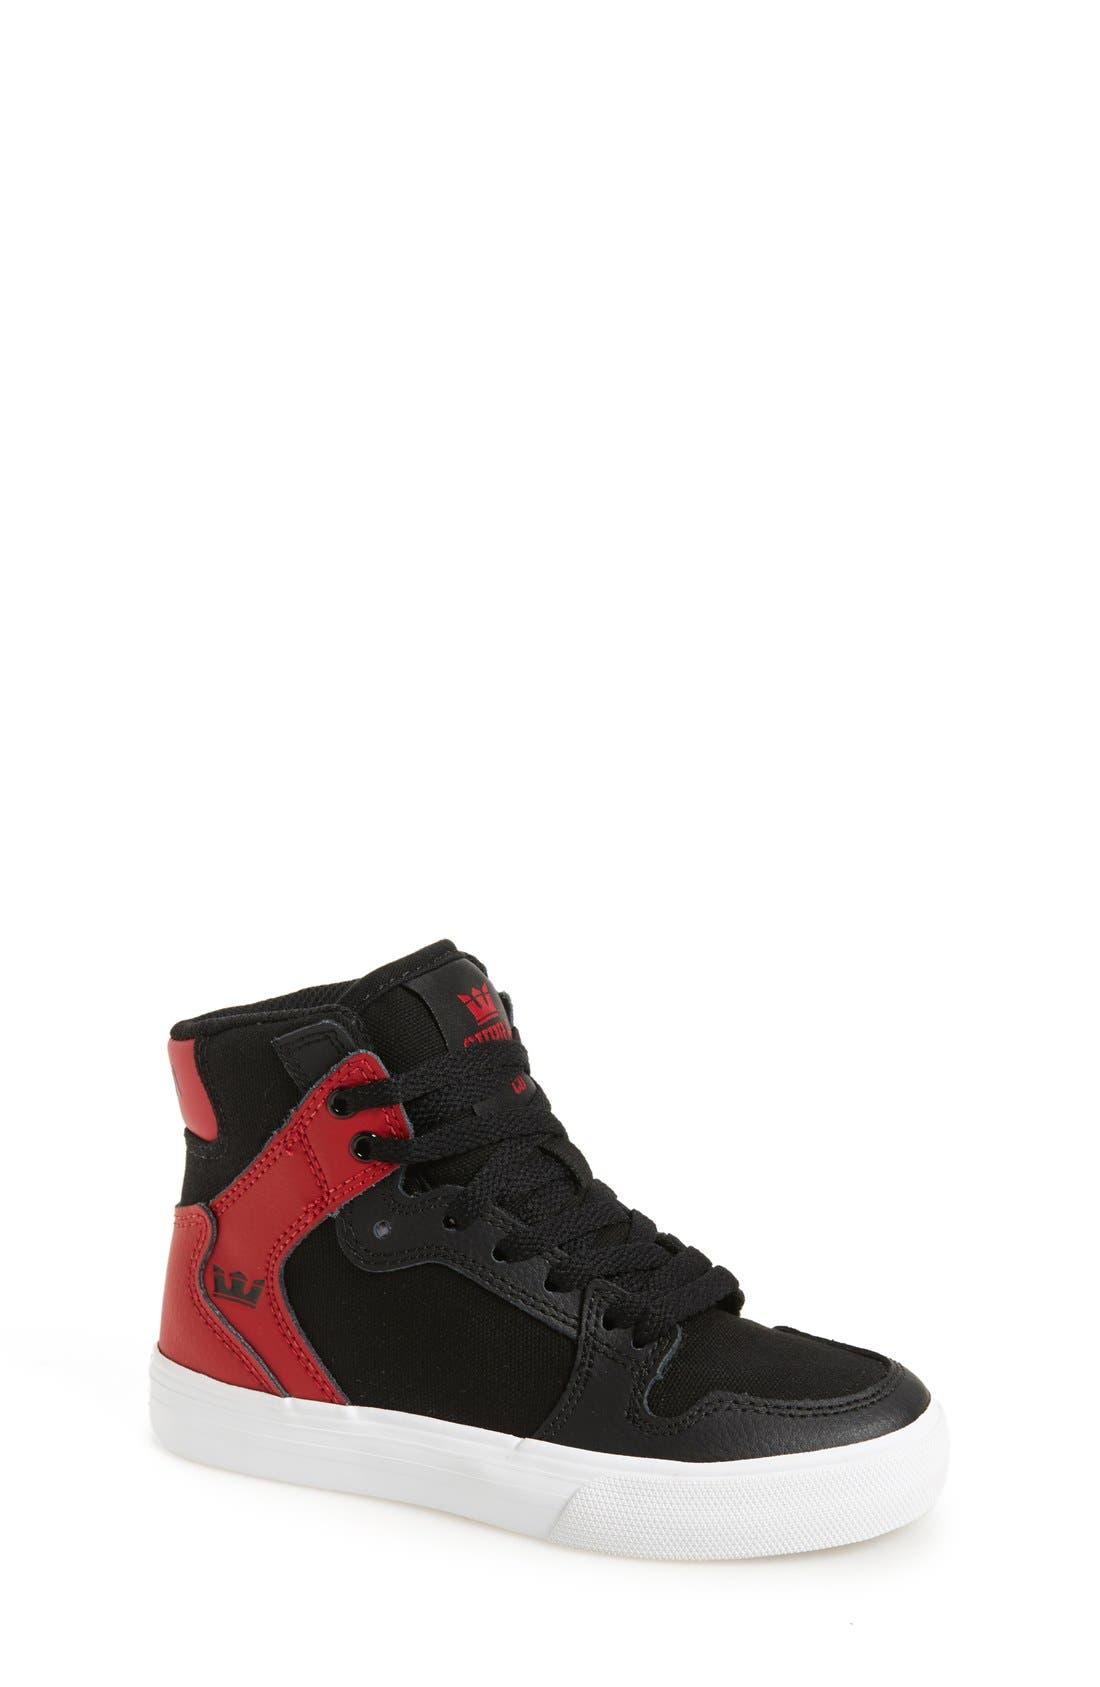 'Vaider' High Top Sneaker,                         Main,                         color, 001